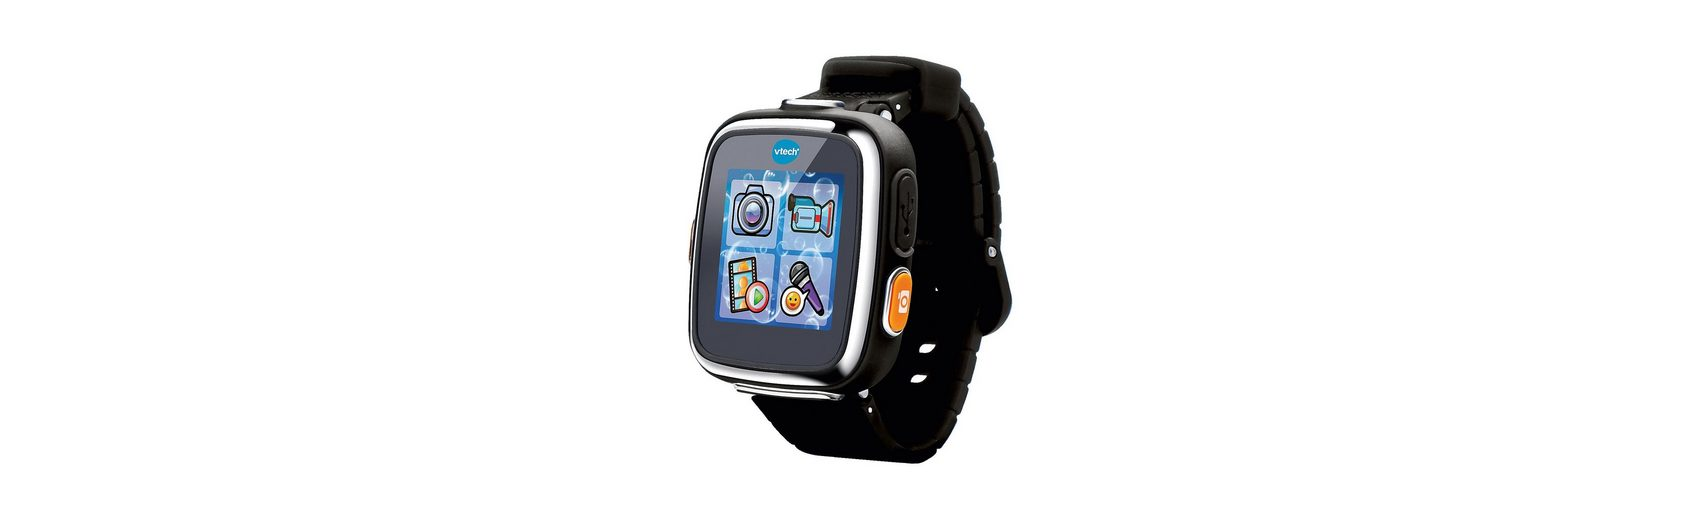 Vtech Kidizoom Smart Watch 2 schwarz